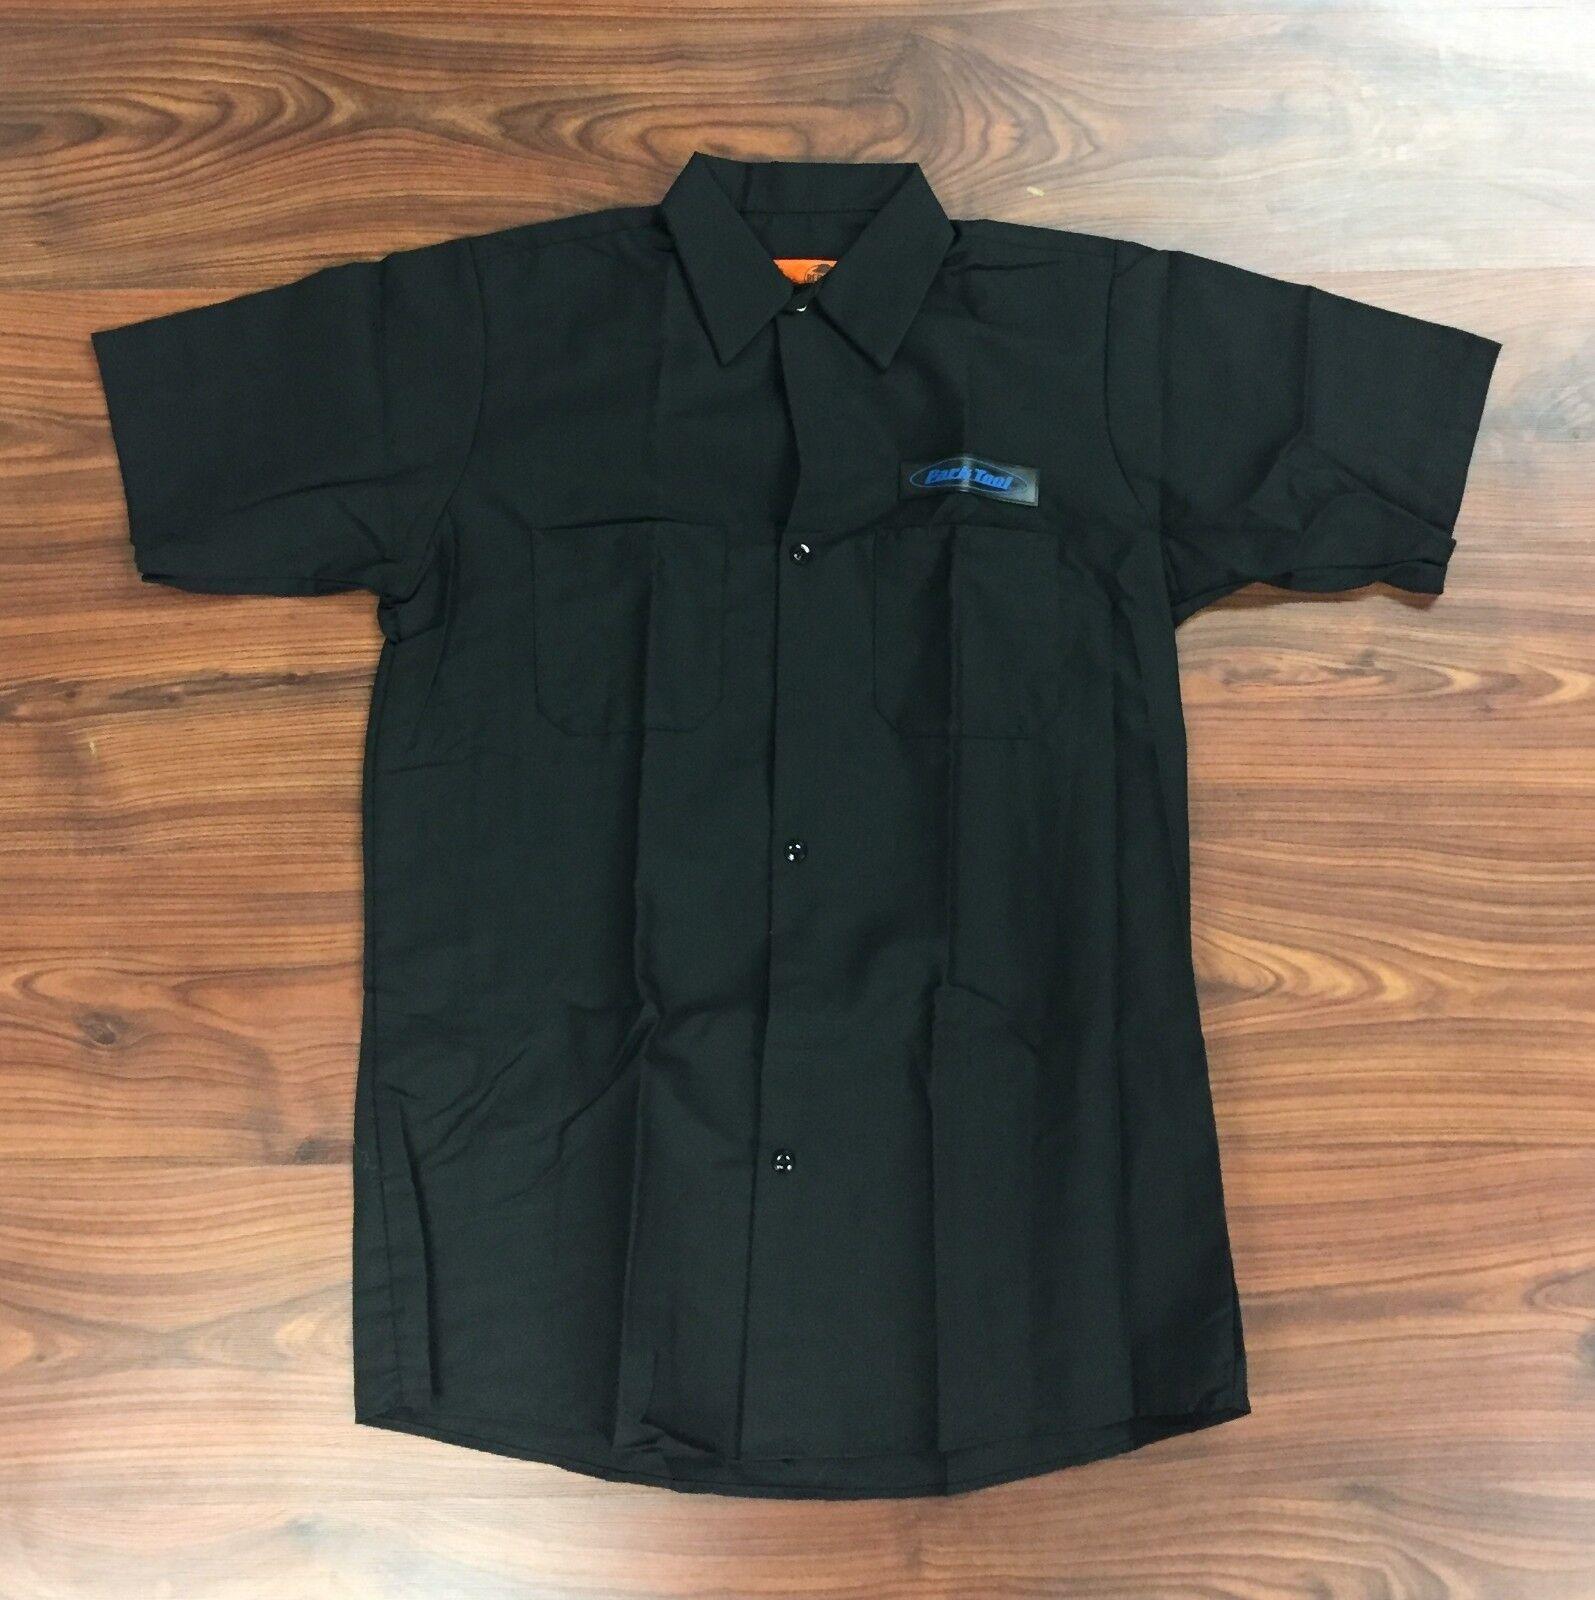 Park Tool Mechanic Work Shirt Size Large New